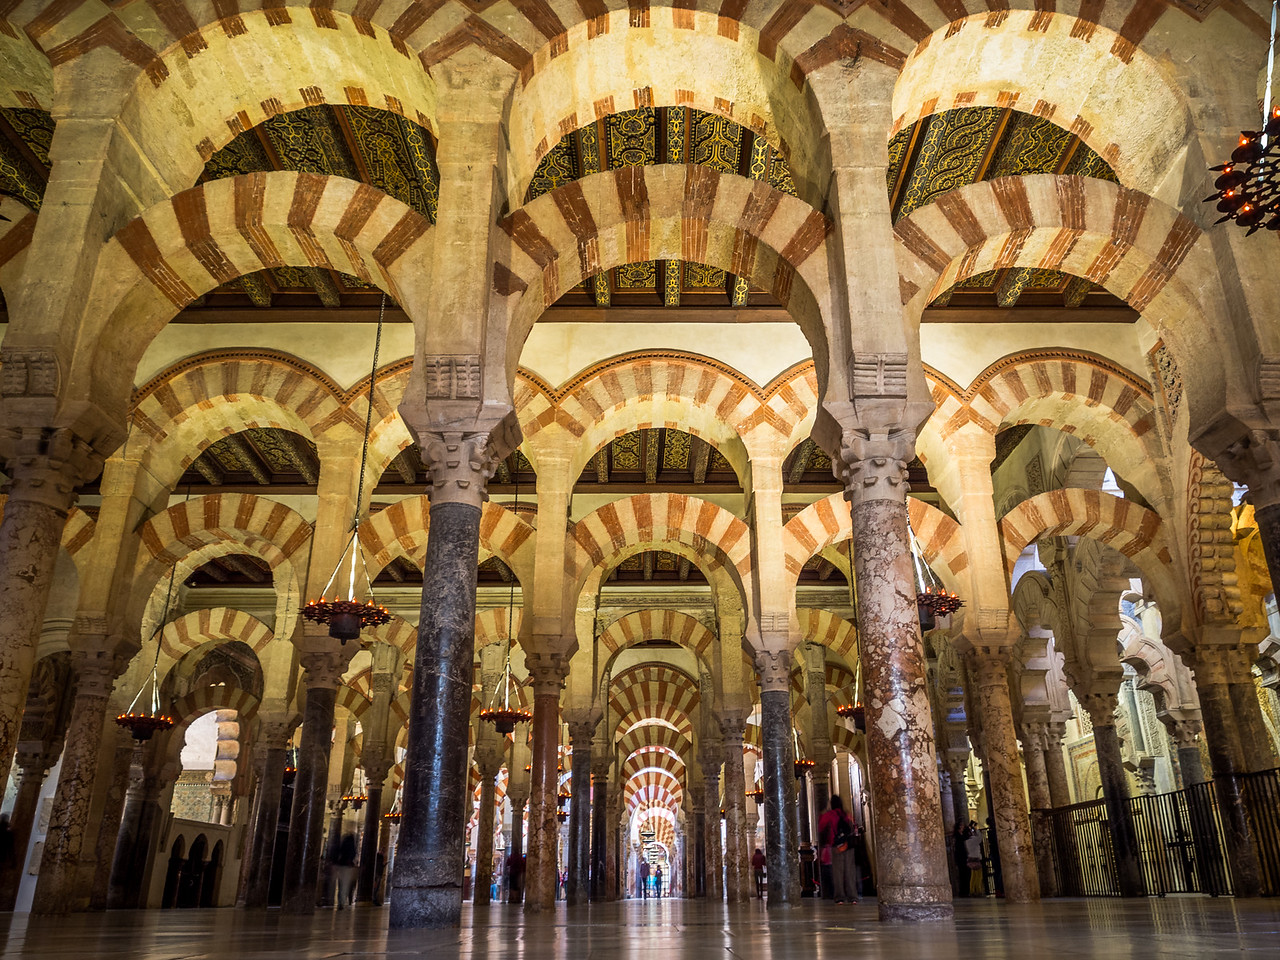 Endless Arcades, Mezquita, Córdoba, Spain